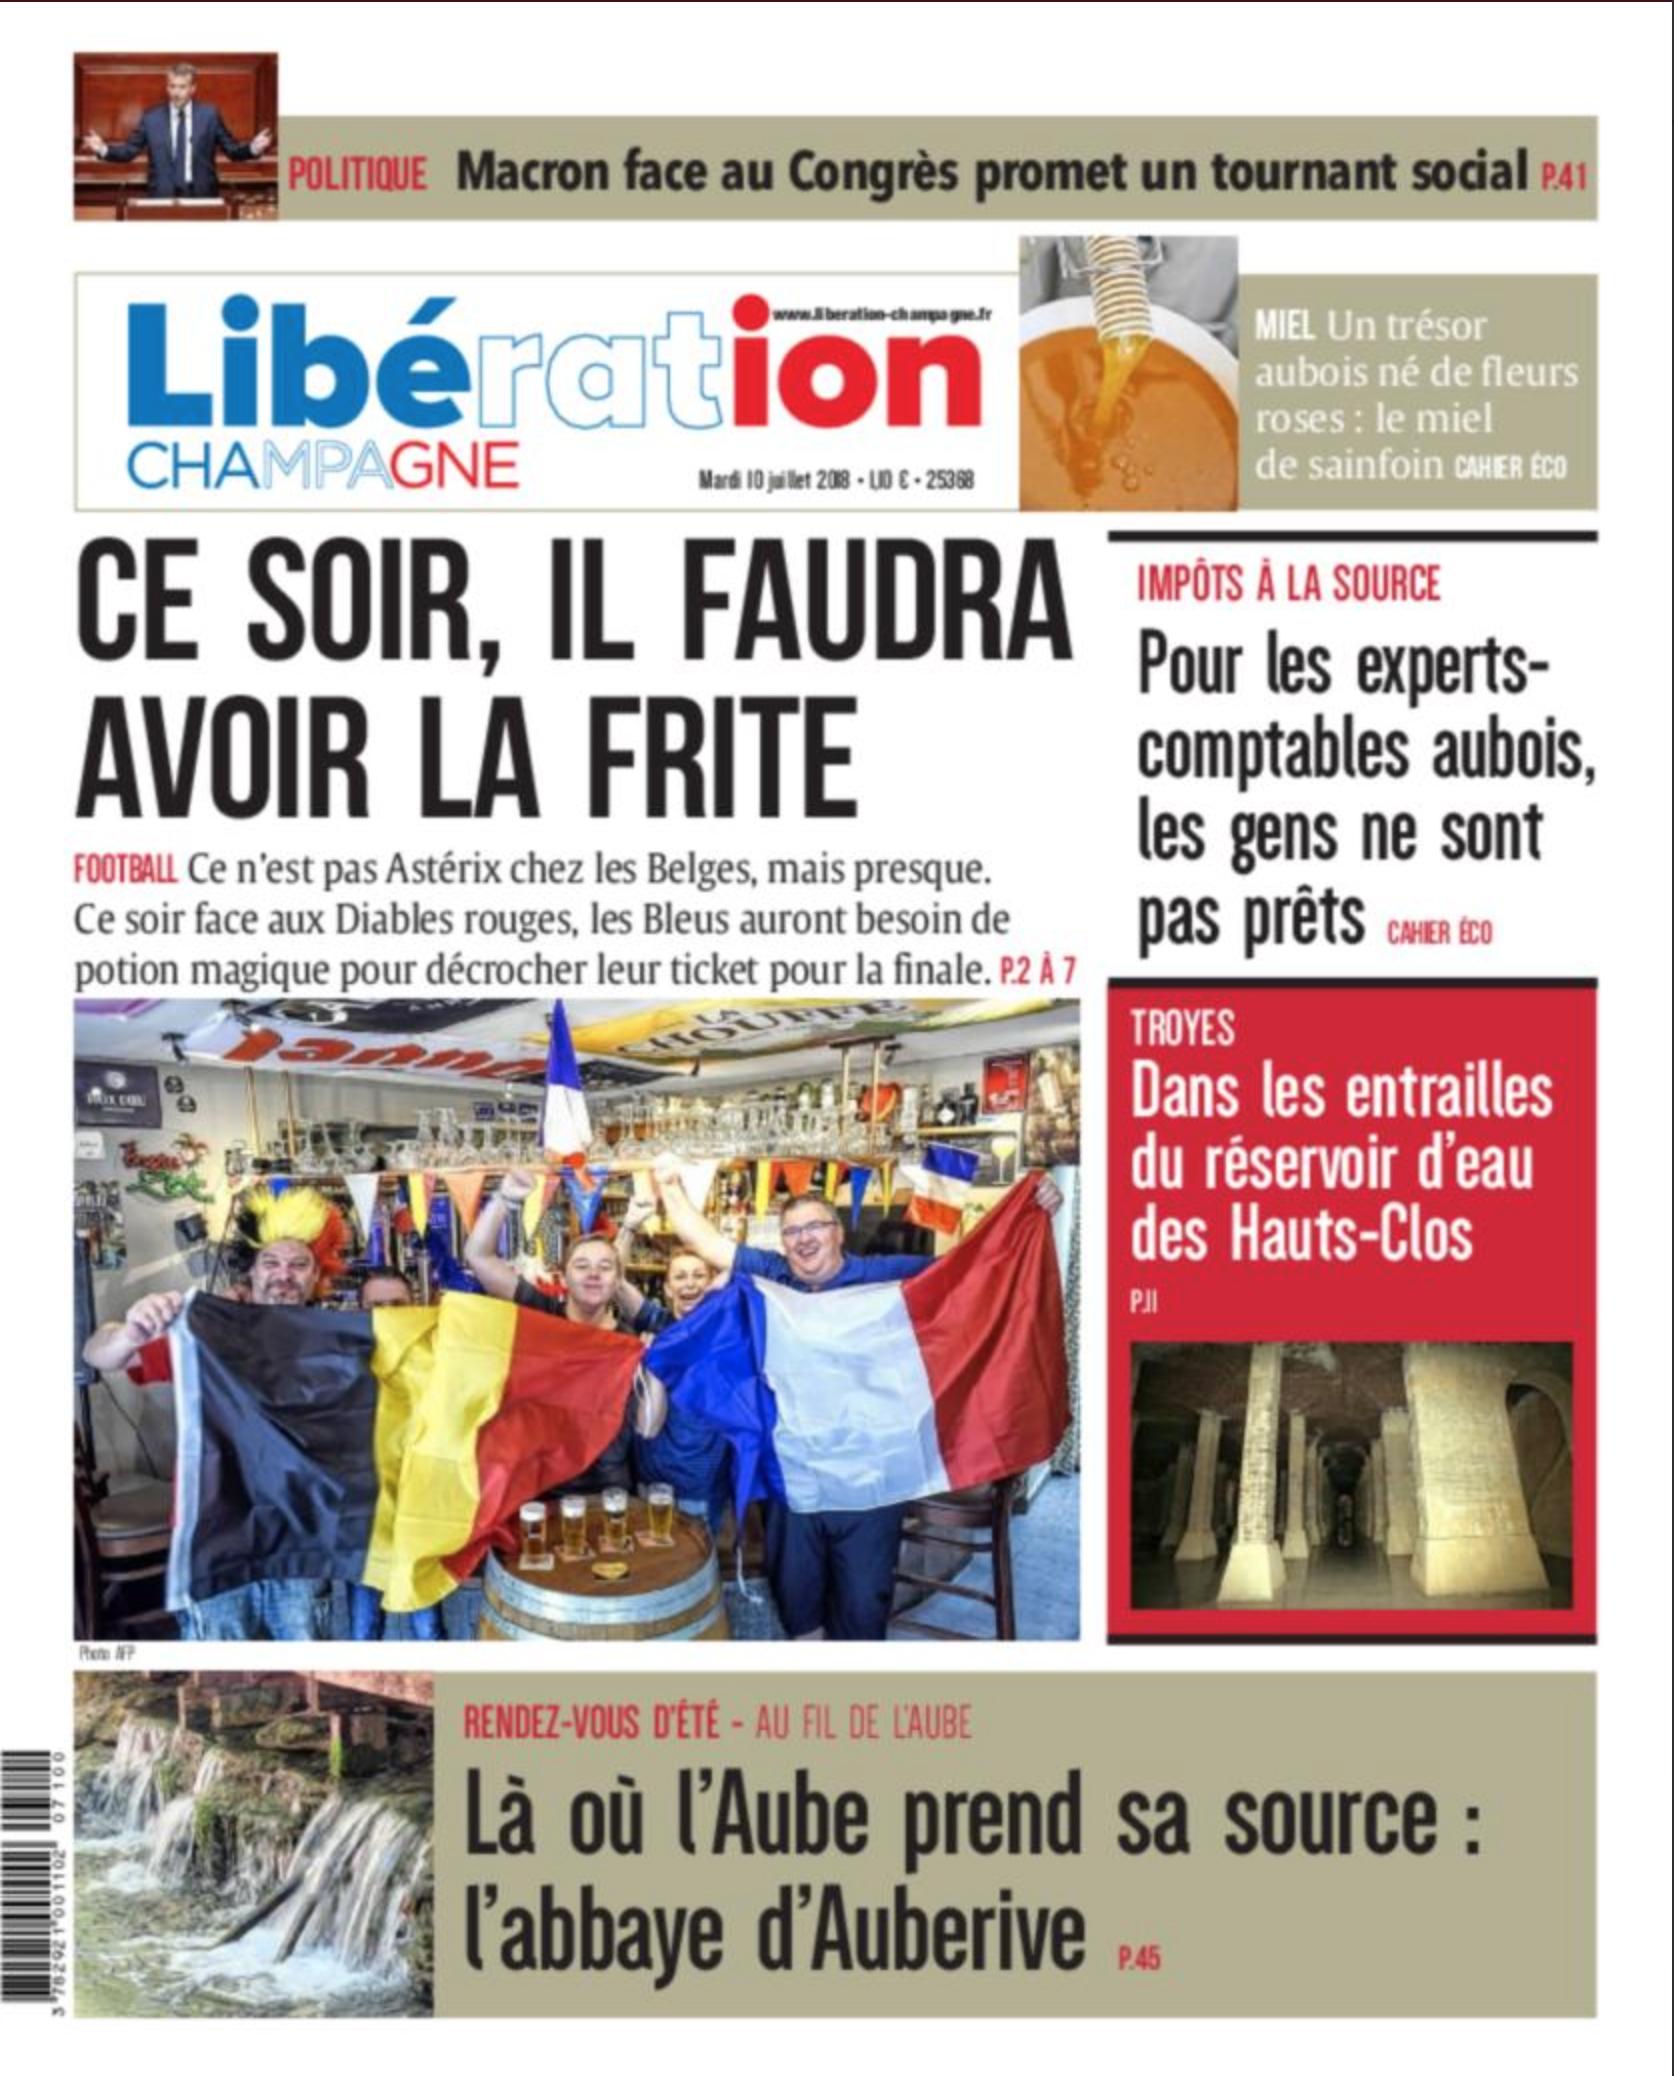 liberationchampagne.jpg